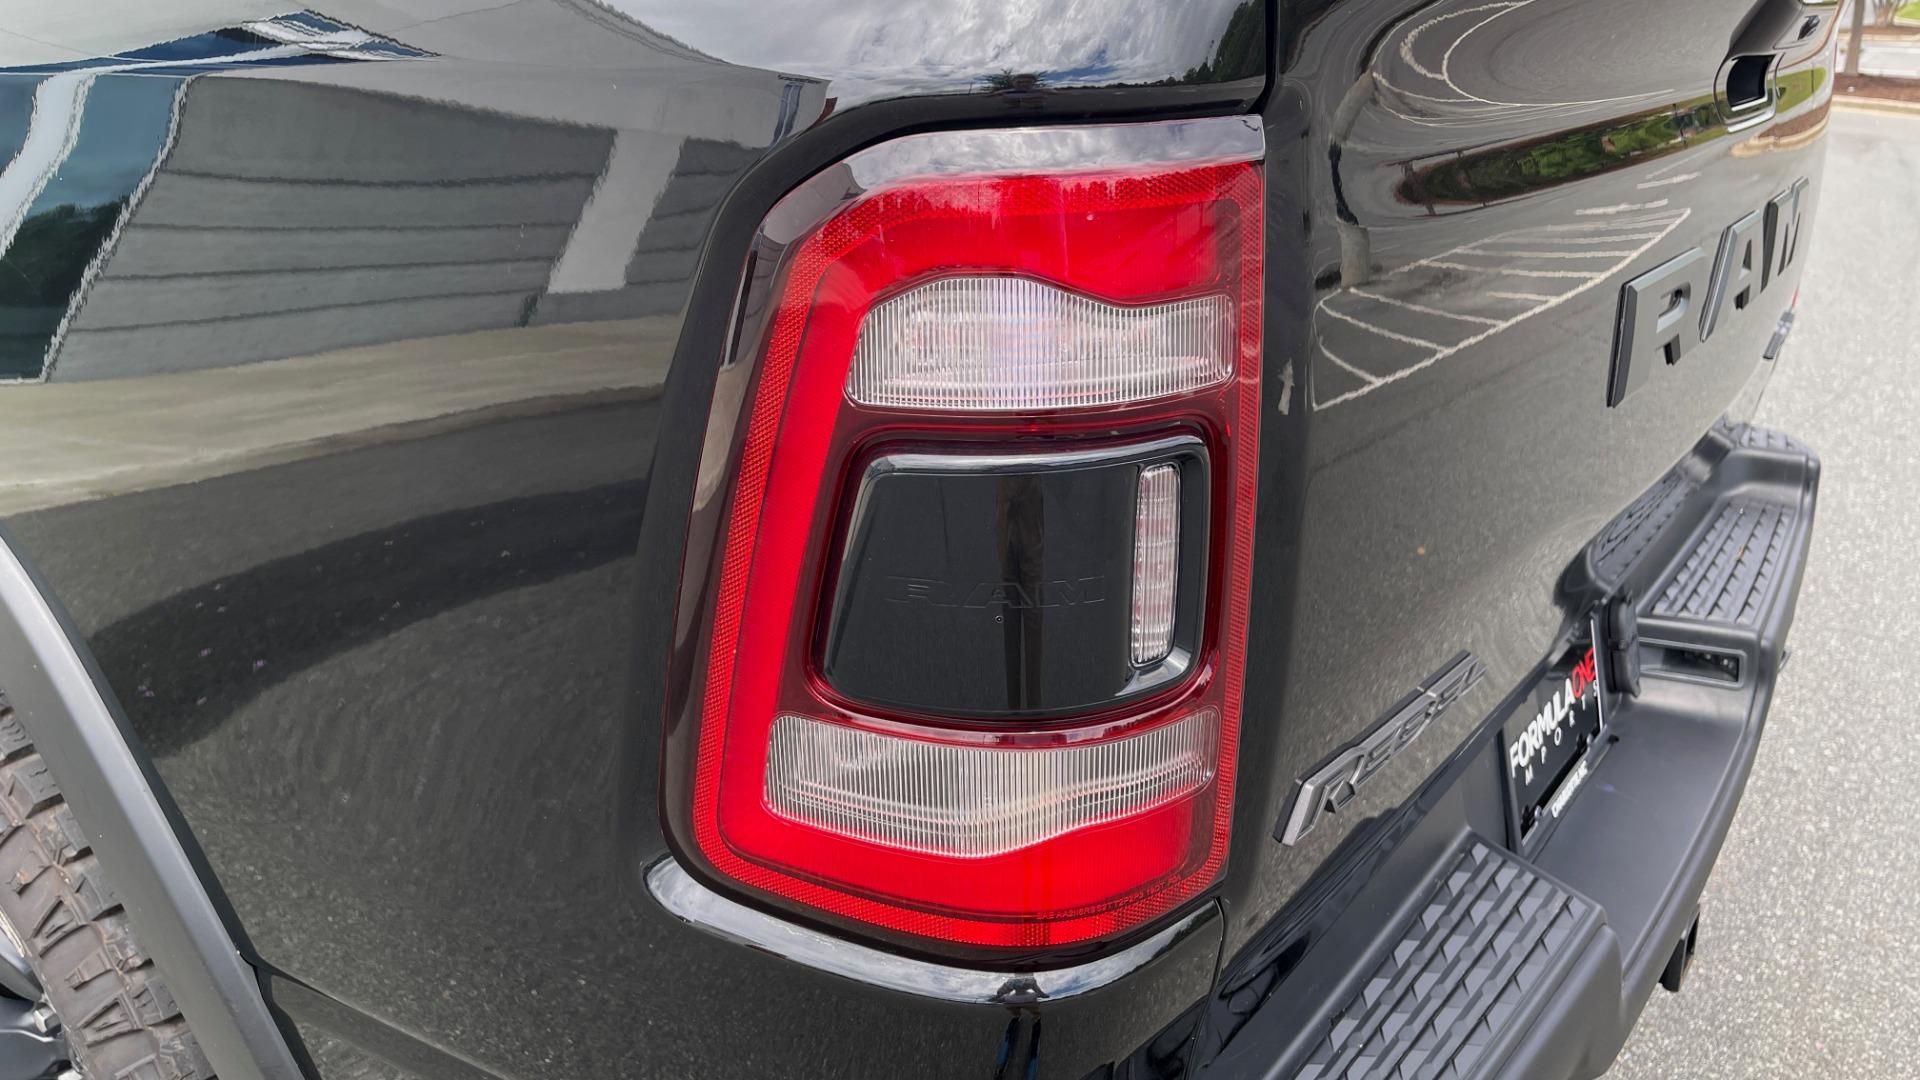 Used 2019 Ram 1500 REBEL QUADCAB 4X4 / 5.7L HEMI / 8-SPD AUTO / REMOTE START / PARK ASSIST for sale $44,495 at Formula Imports in Charlotte NC 28227 25